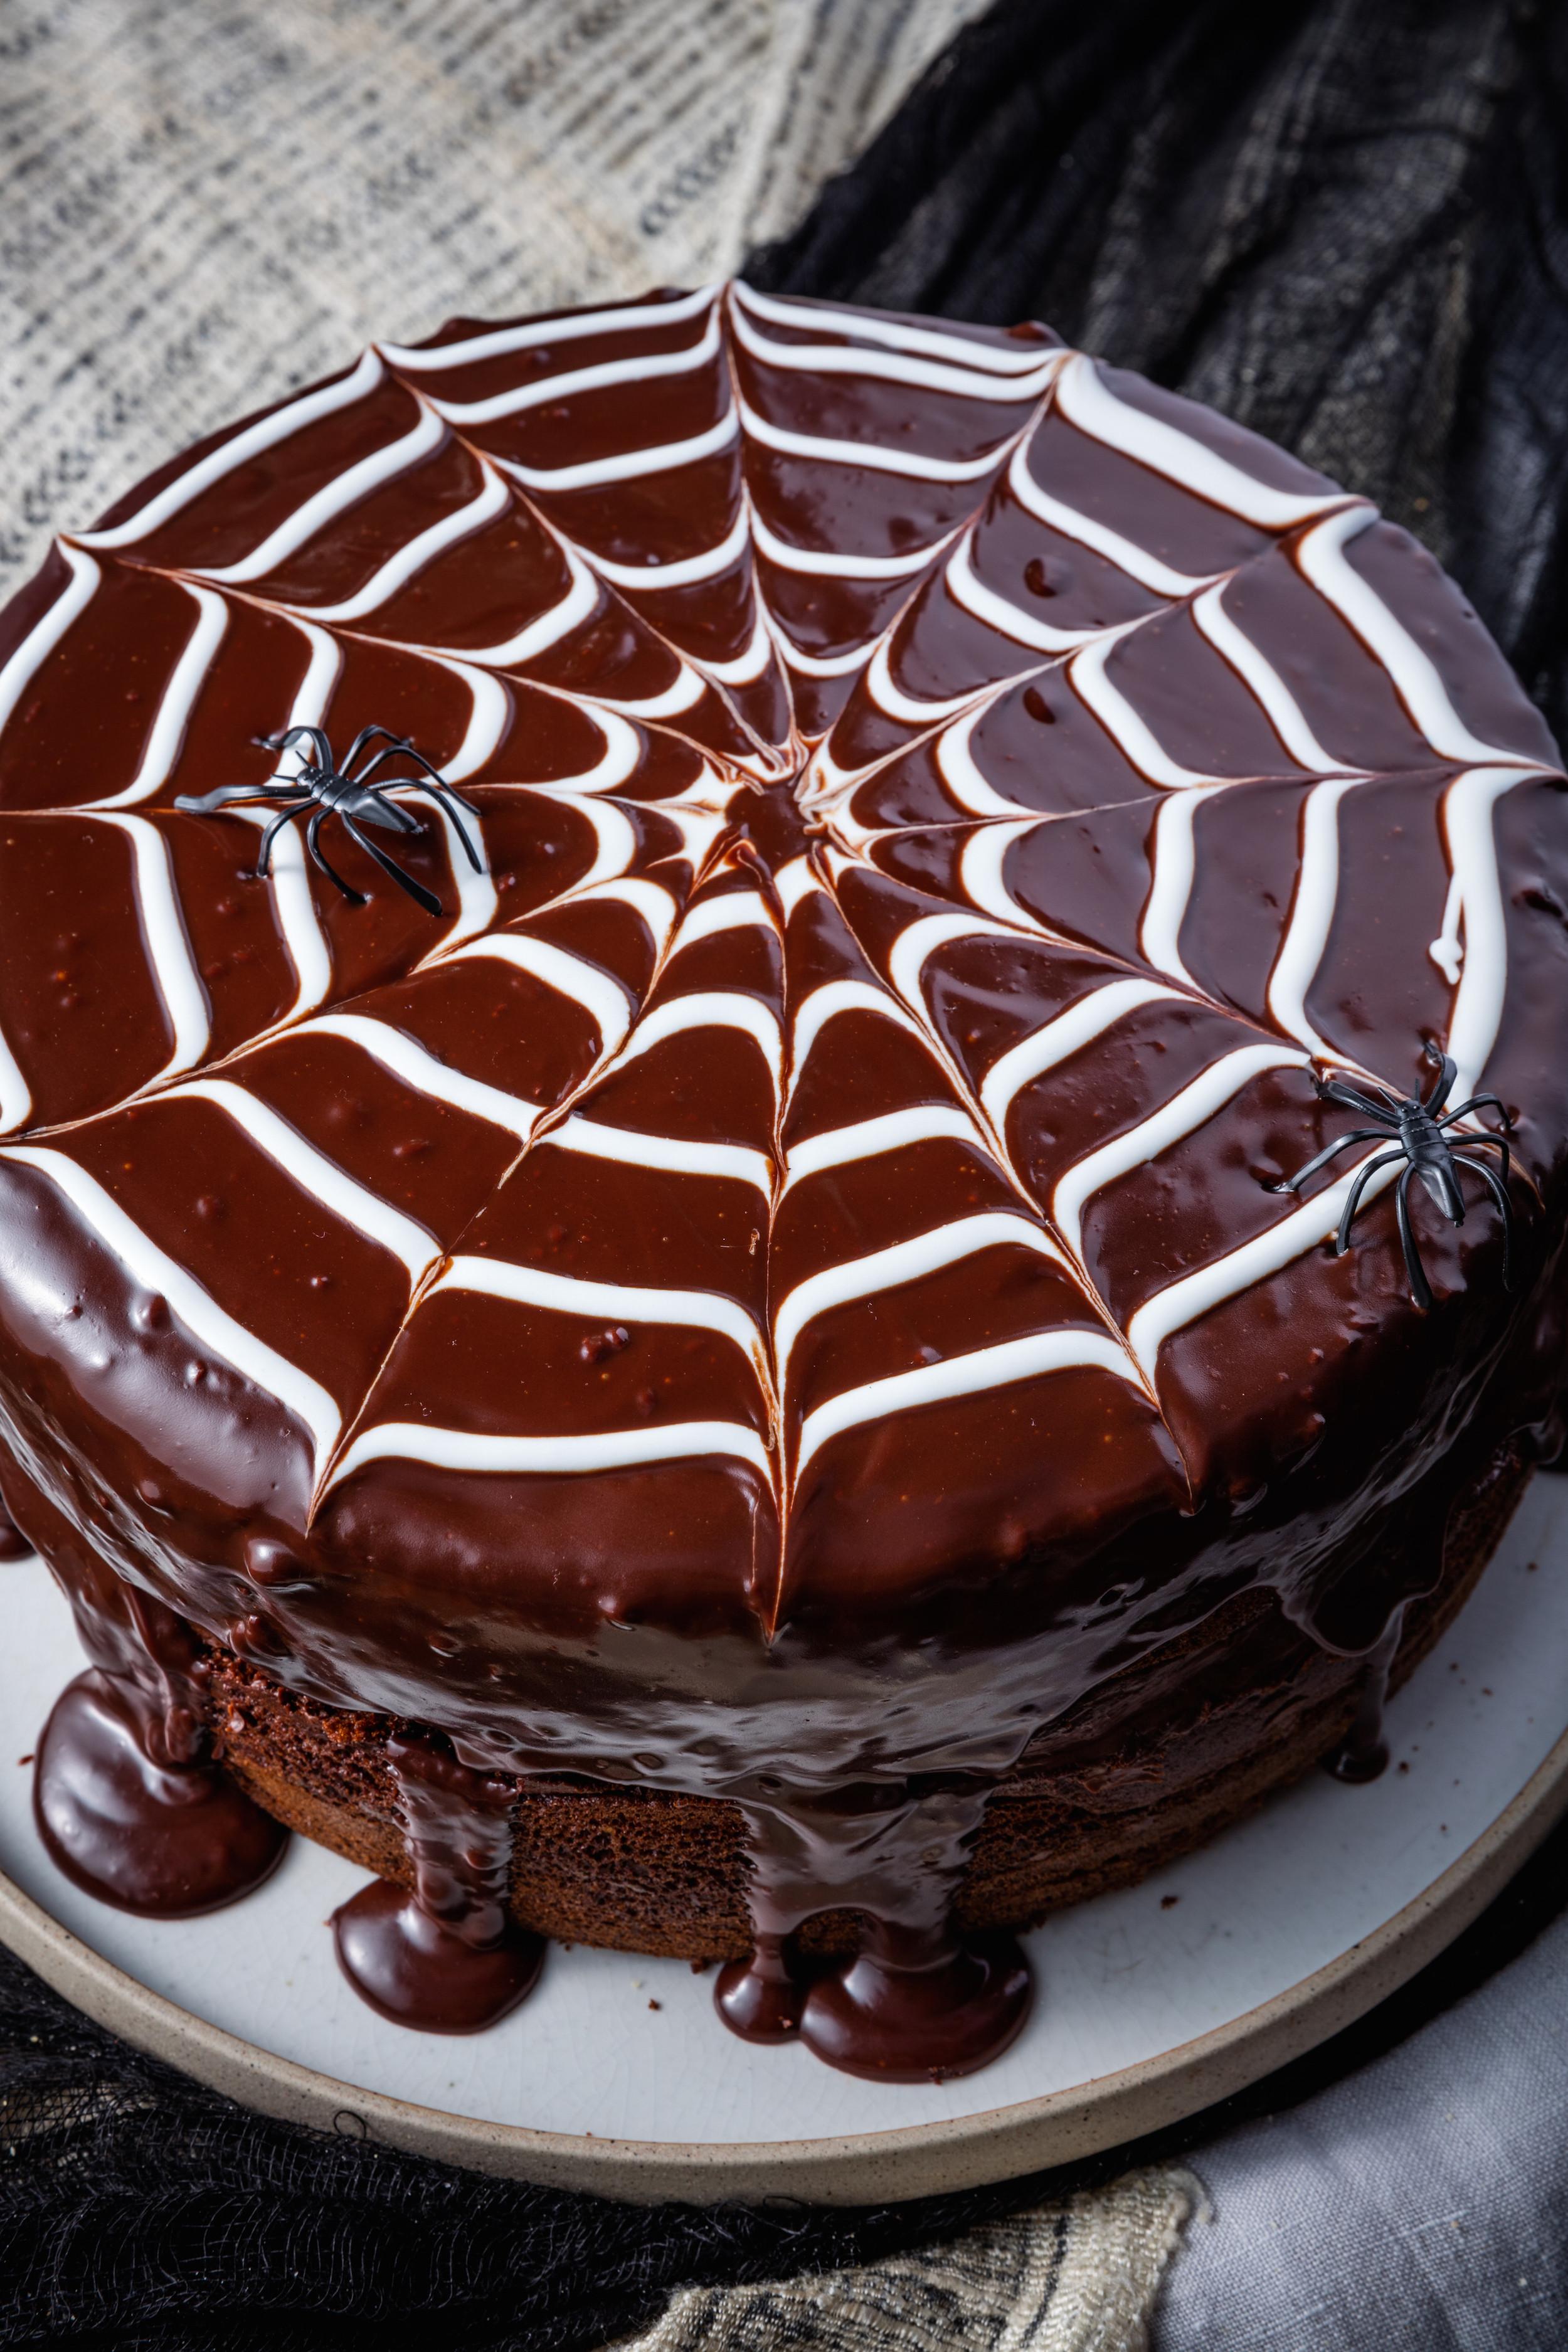 Halloween Cake Recipe  17 Easy Halloween Recipes Gross and Scary Halloween Food